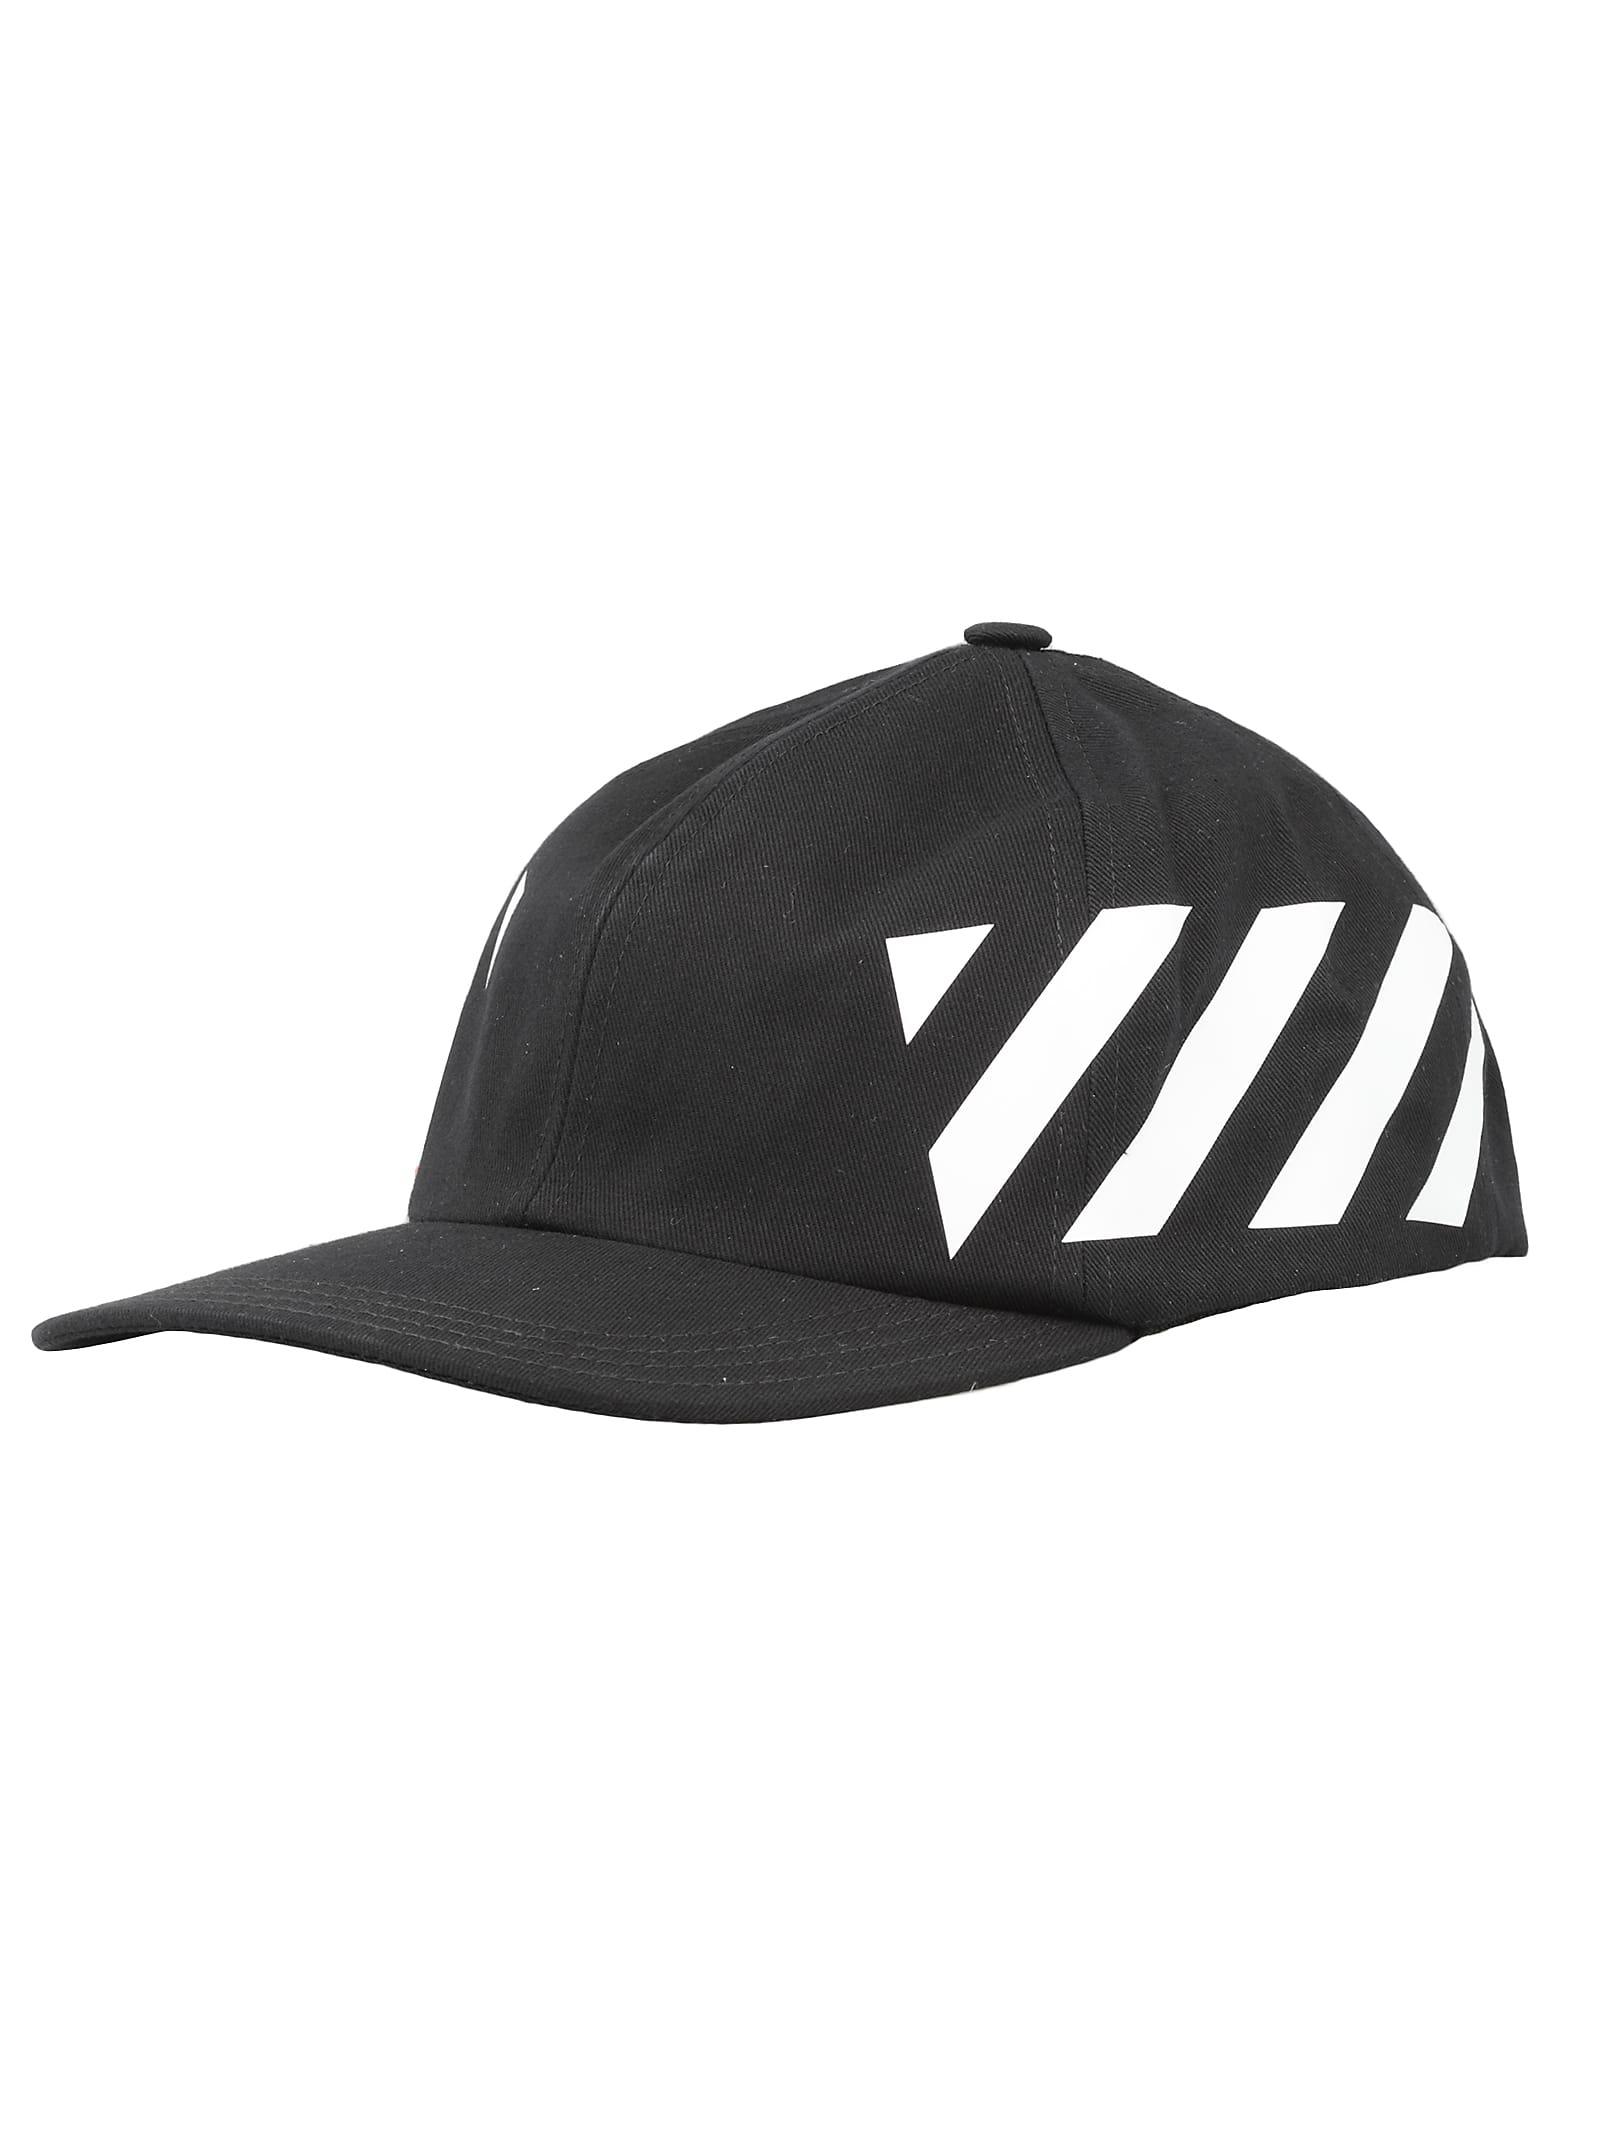 132c27340 Off-White Diag Baseball Cap